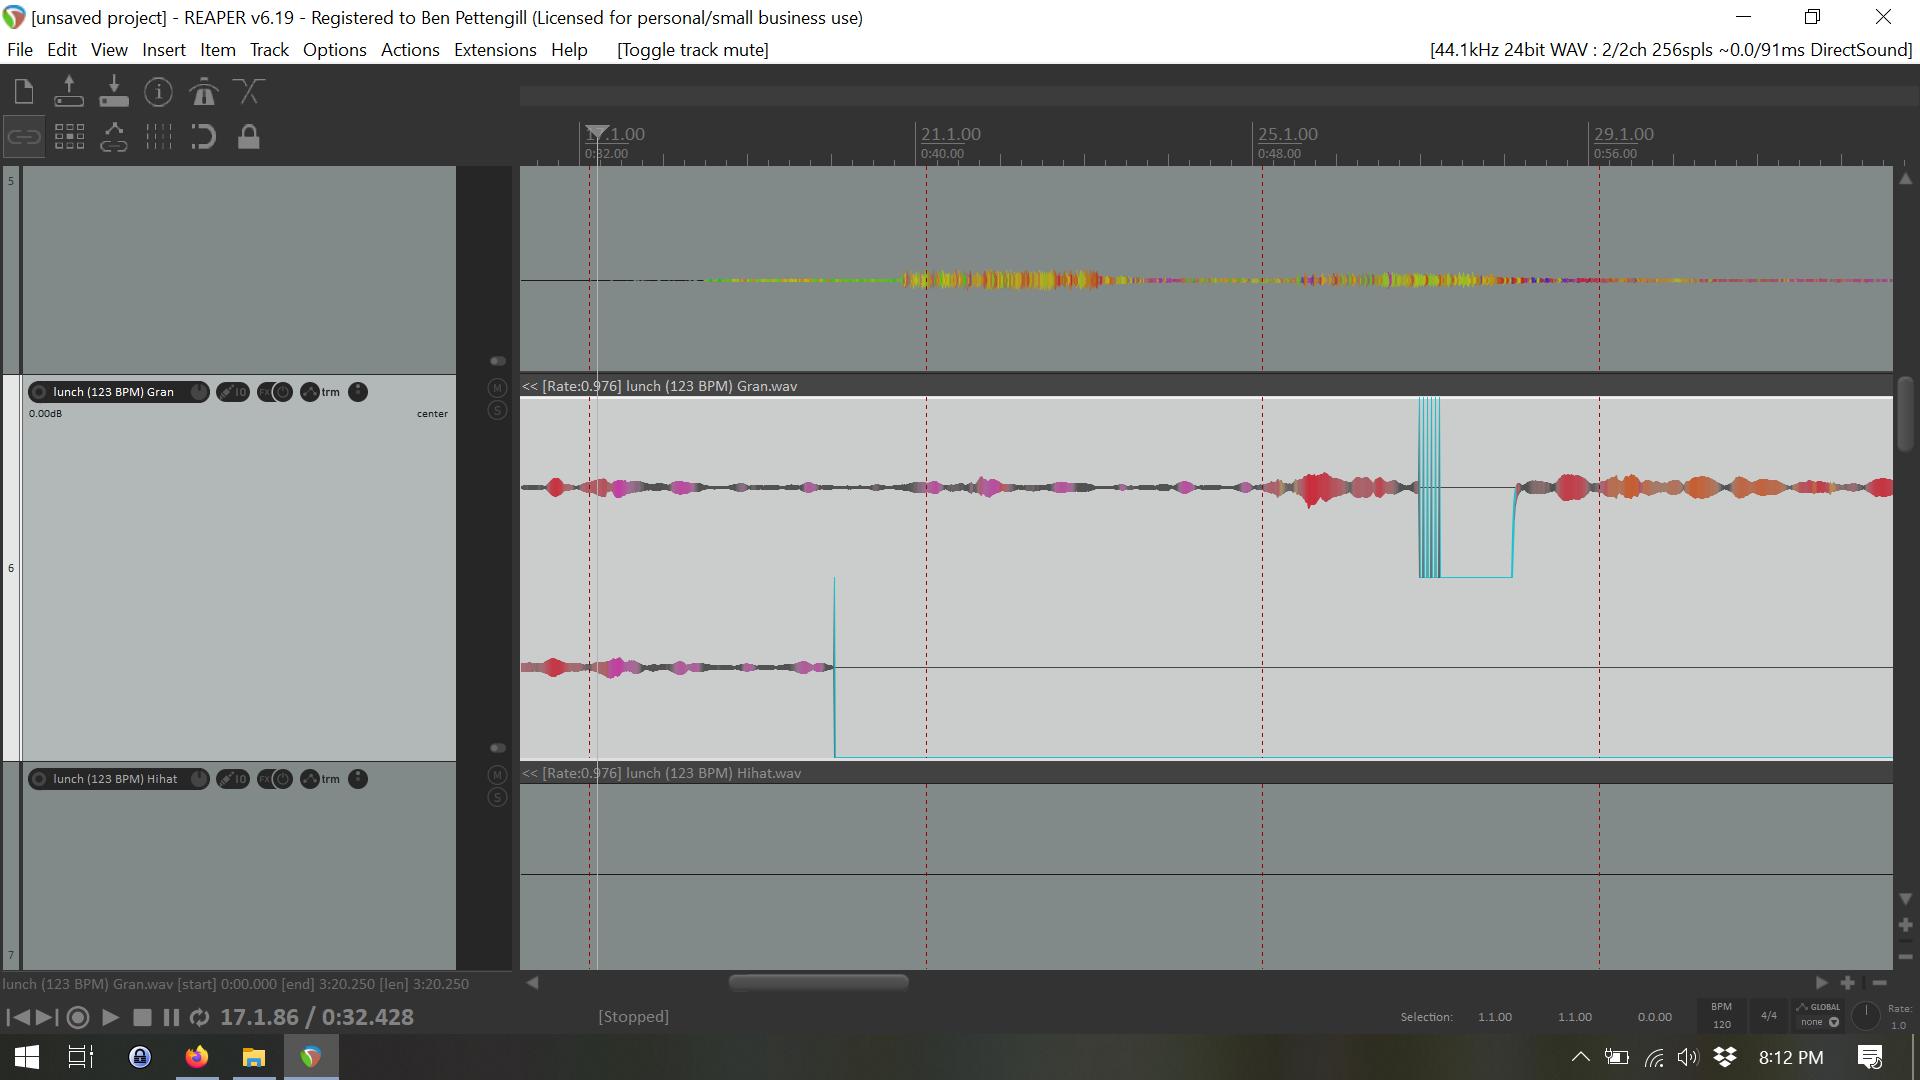 Screenshot 2021-09-13 20.12.38